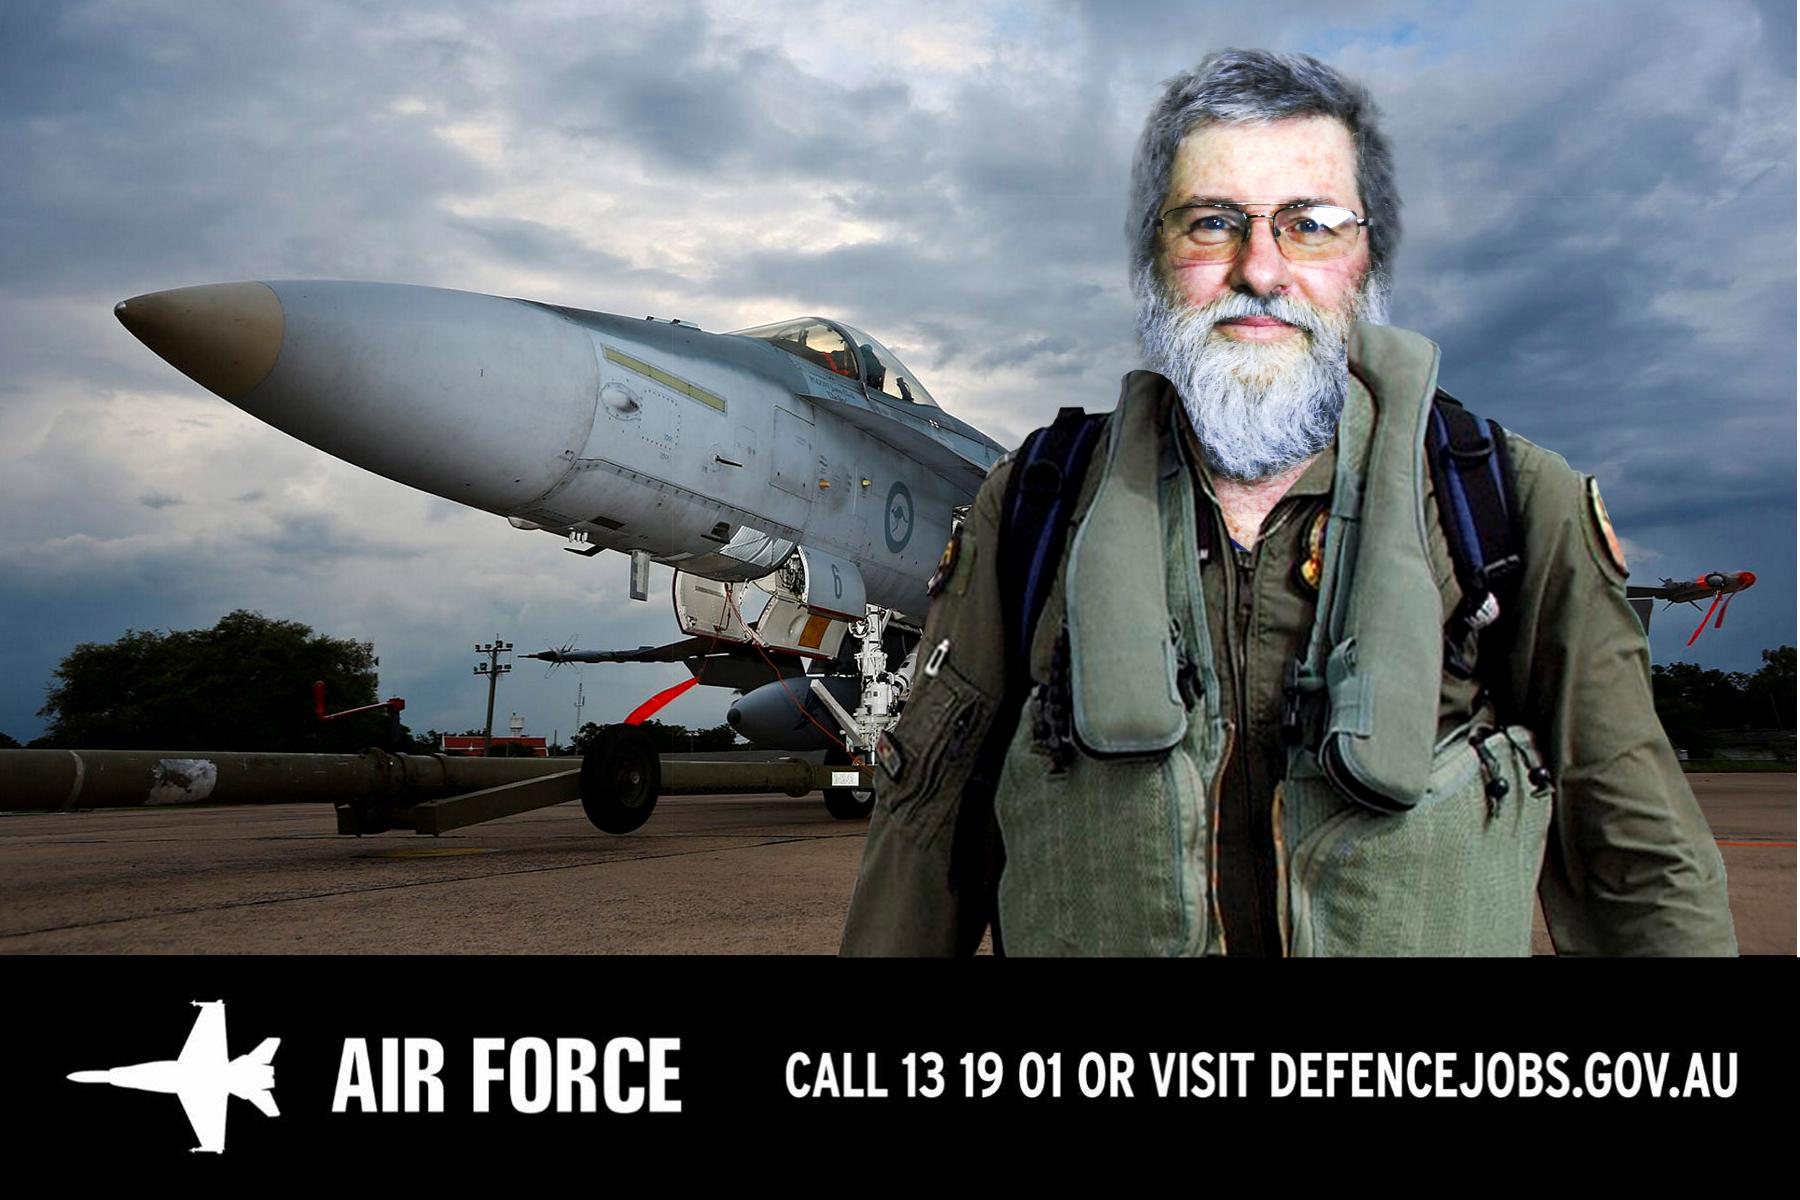 NOWlGREEN SCREEN - Air Force 1.jpg